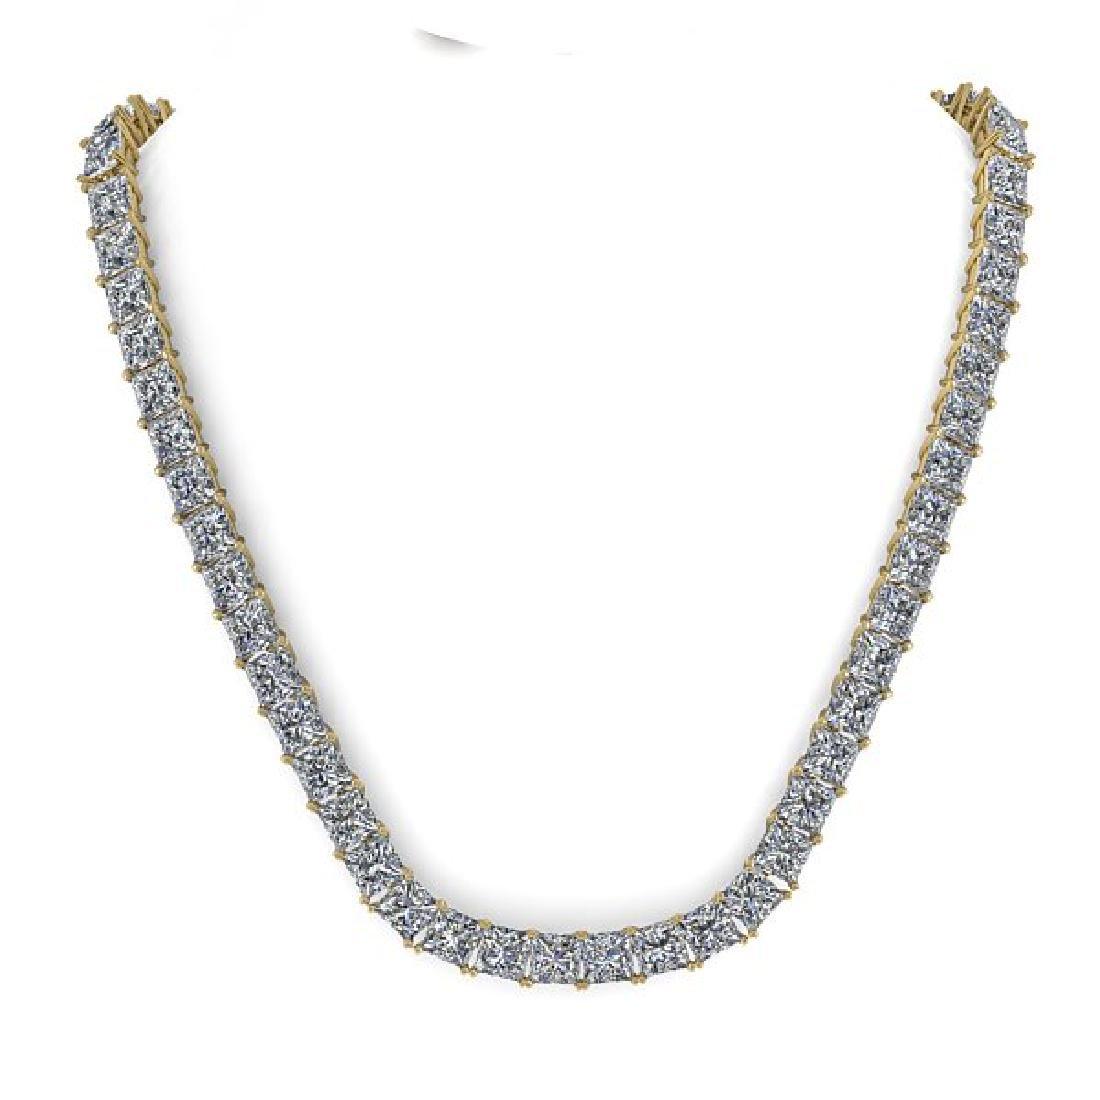 50 CTW Princess Certified SI Diamond Necklace 14K - 3